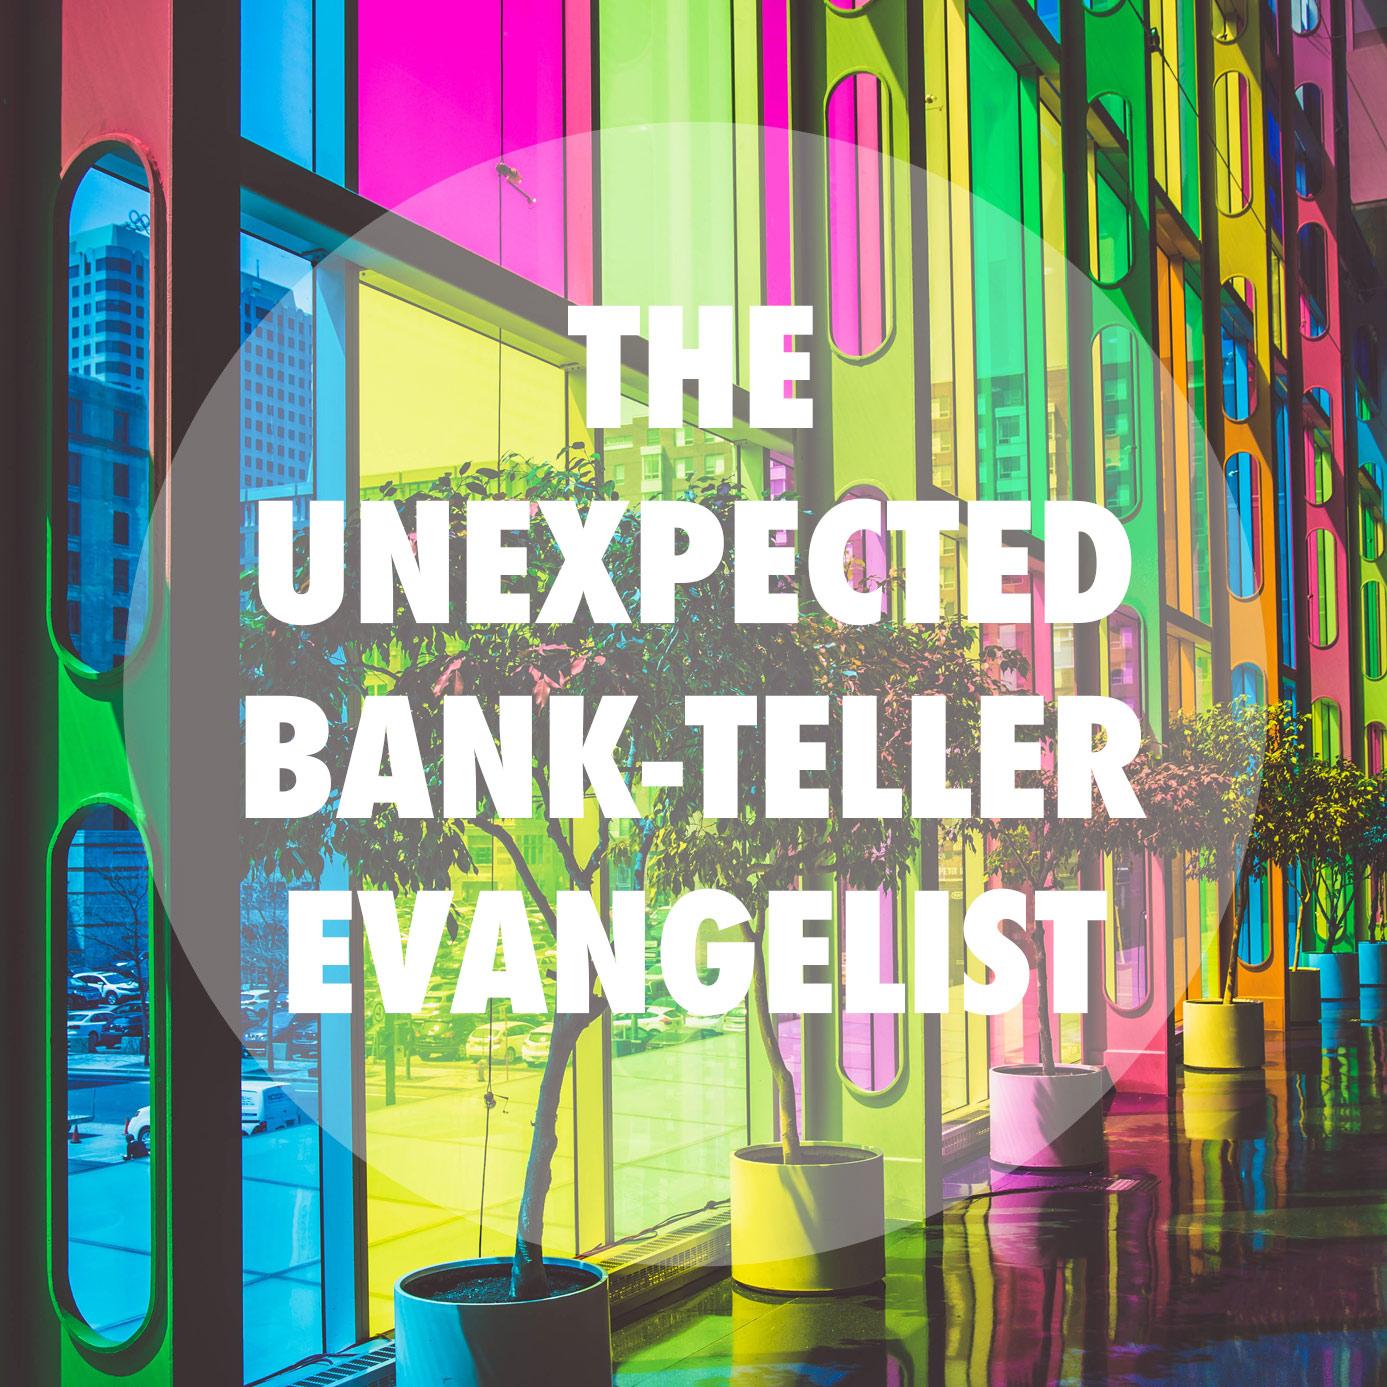 bank-teller-evangelist